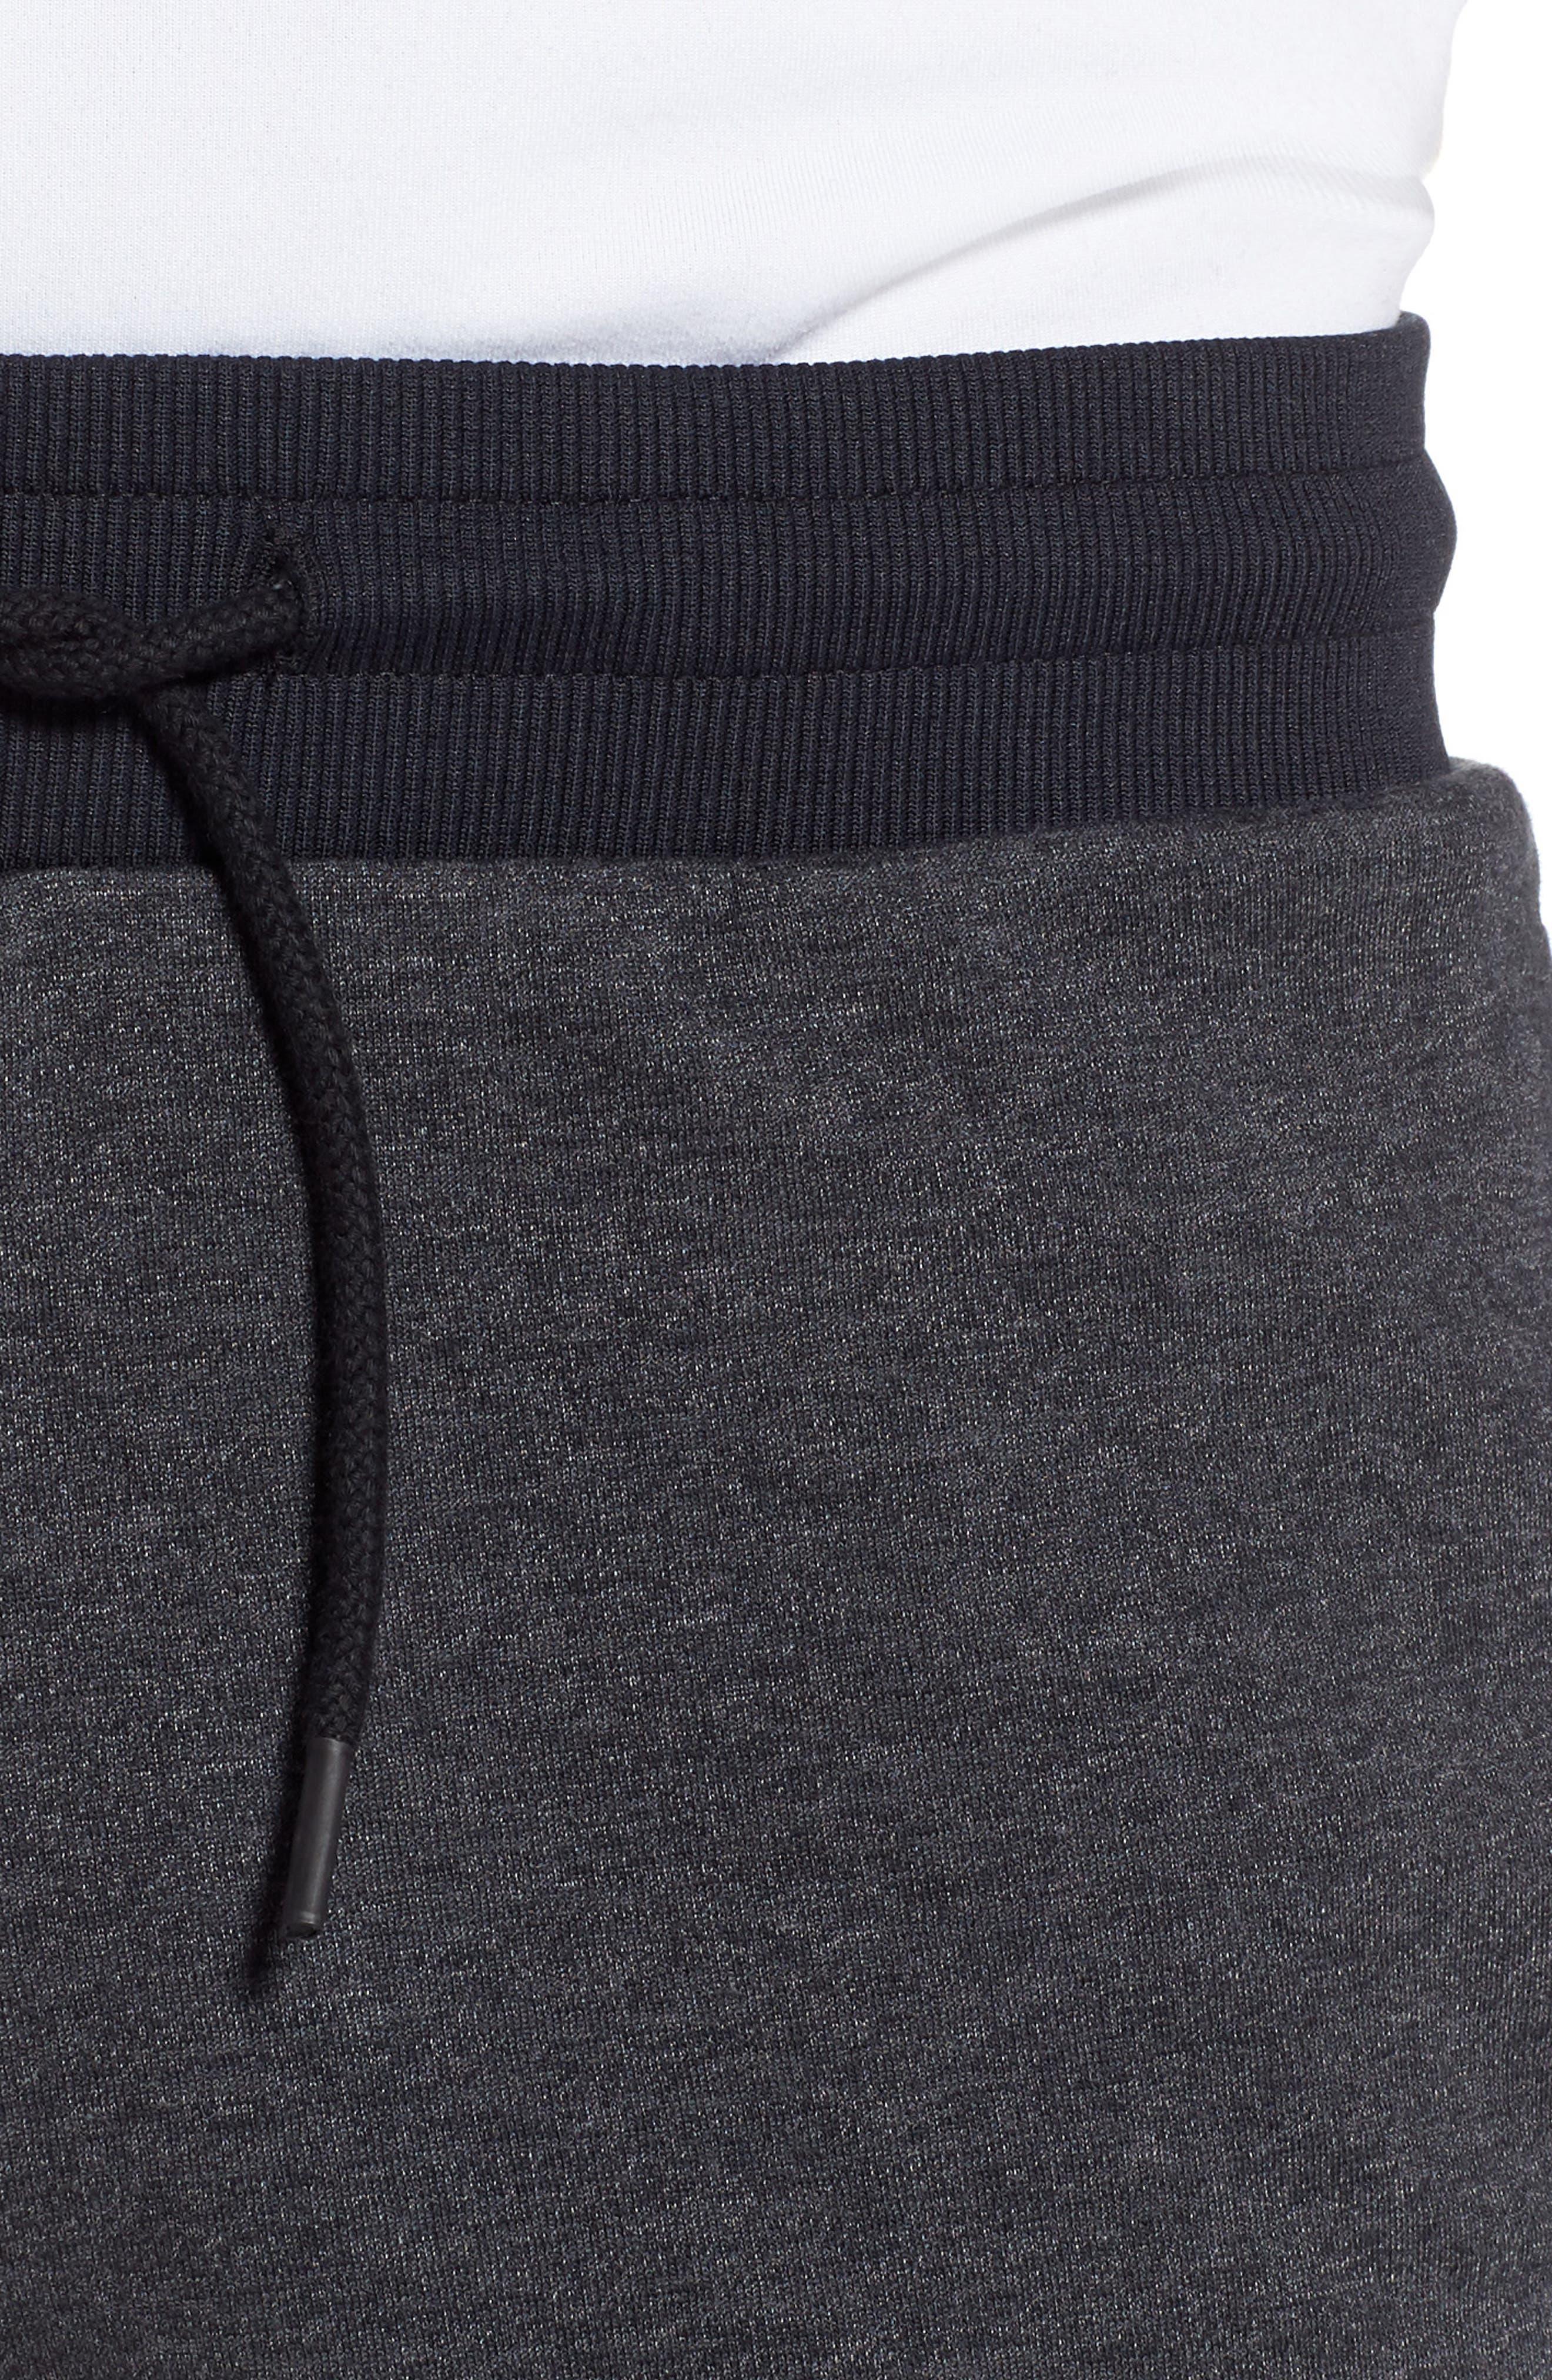 UNDER ARMOUR,                             Unstoppable Double Knit Jogger Pants,                             Alternate thumbnail 4, color,                             001